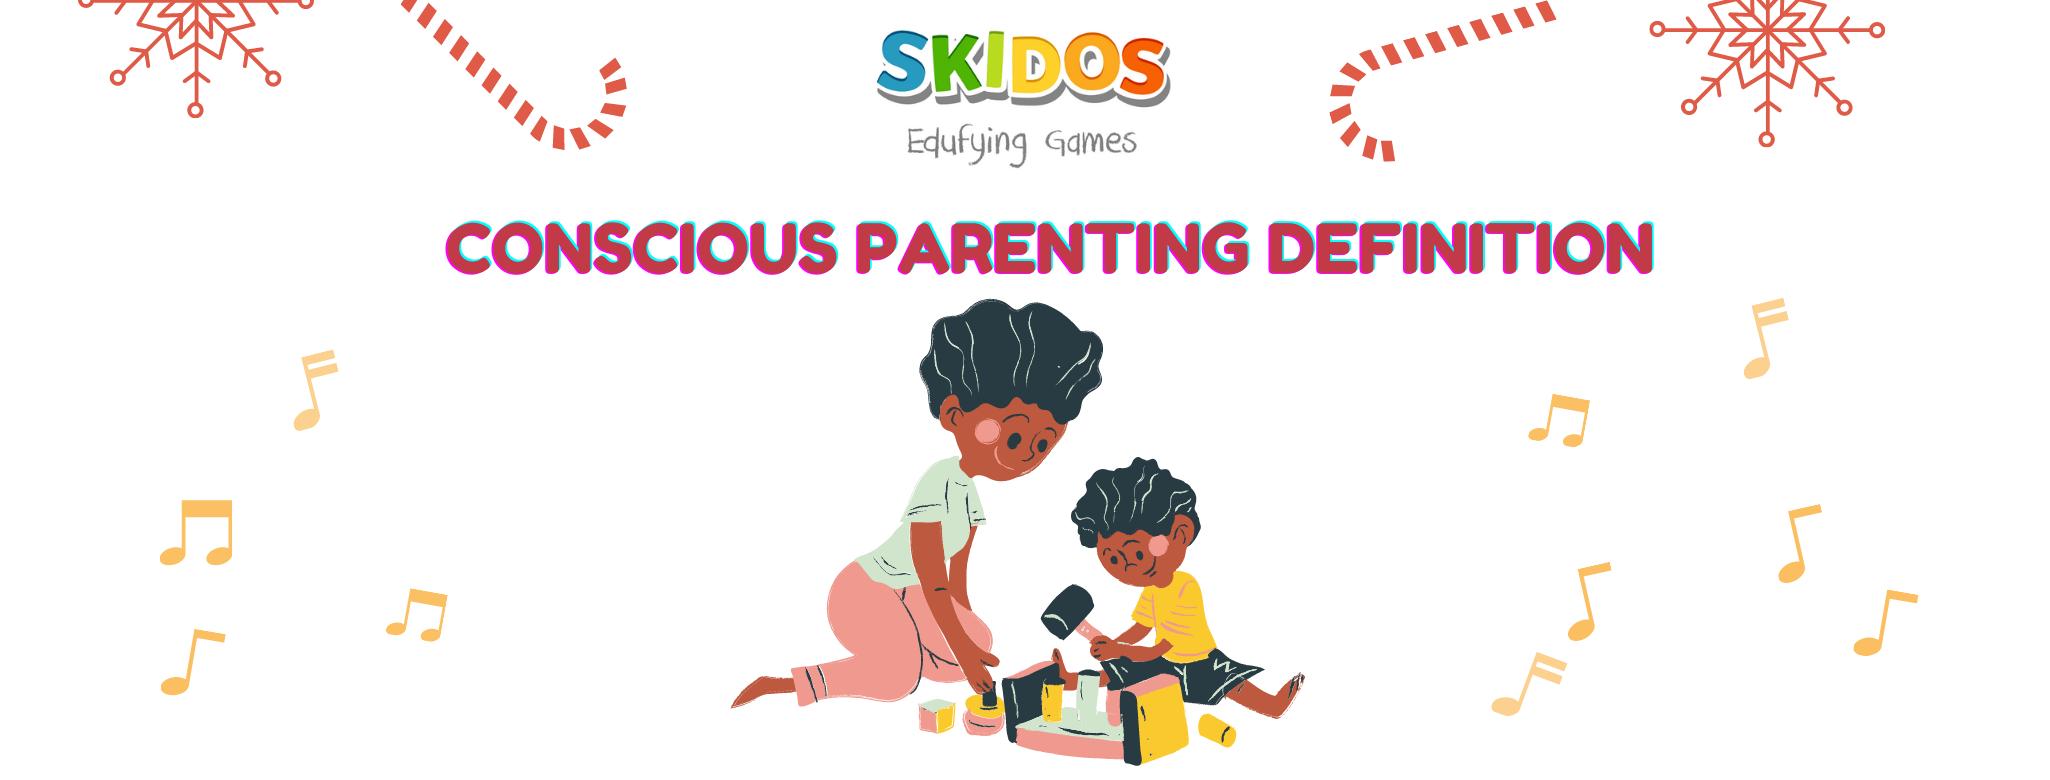 conscious parenting DEFINITION